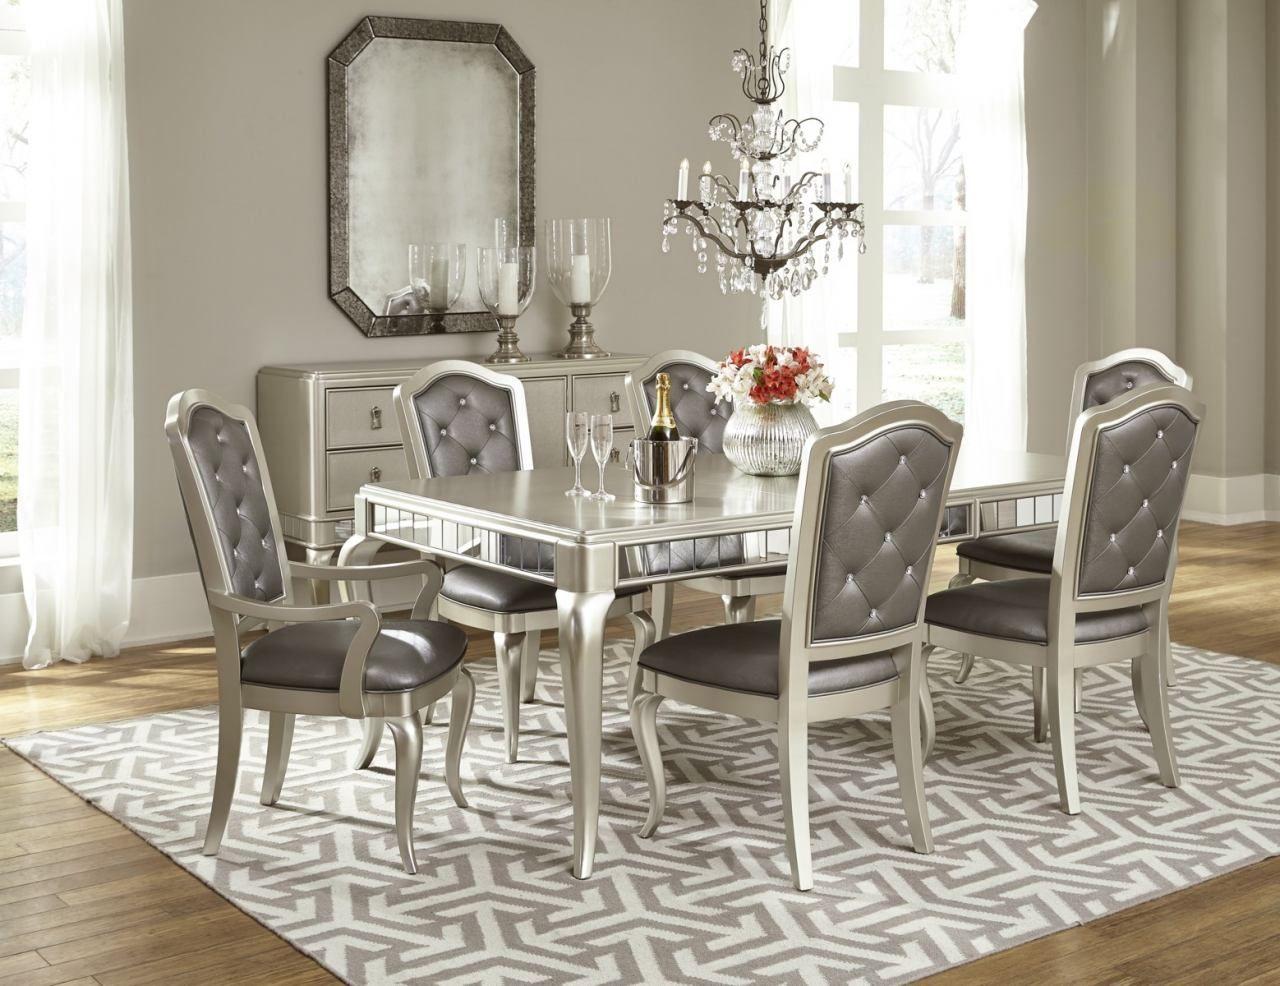 rectangle kitchen table set. Samuel Lawrence Diva 7-Piece Rectangular Dining Set In Metallic Rectangle Kitchen Table